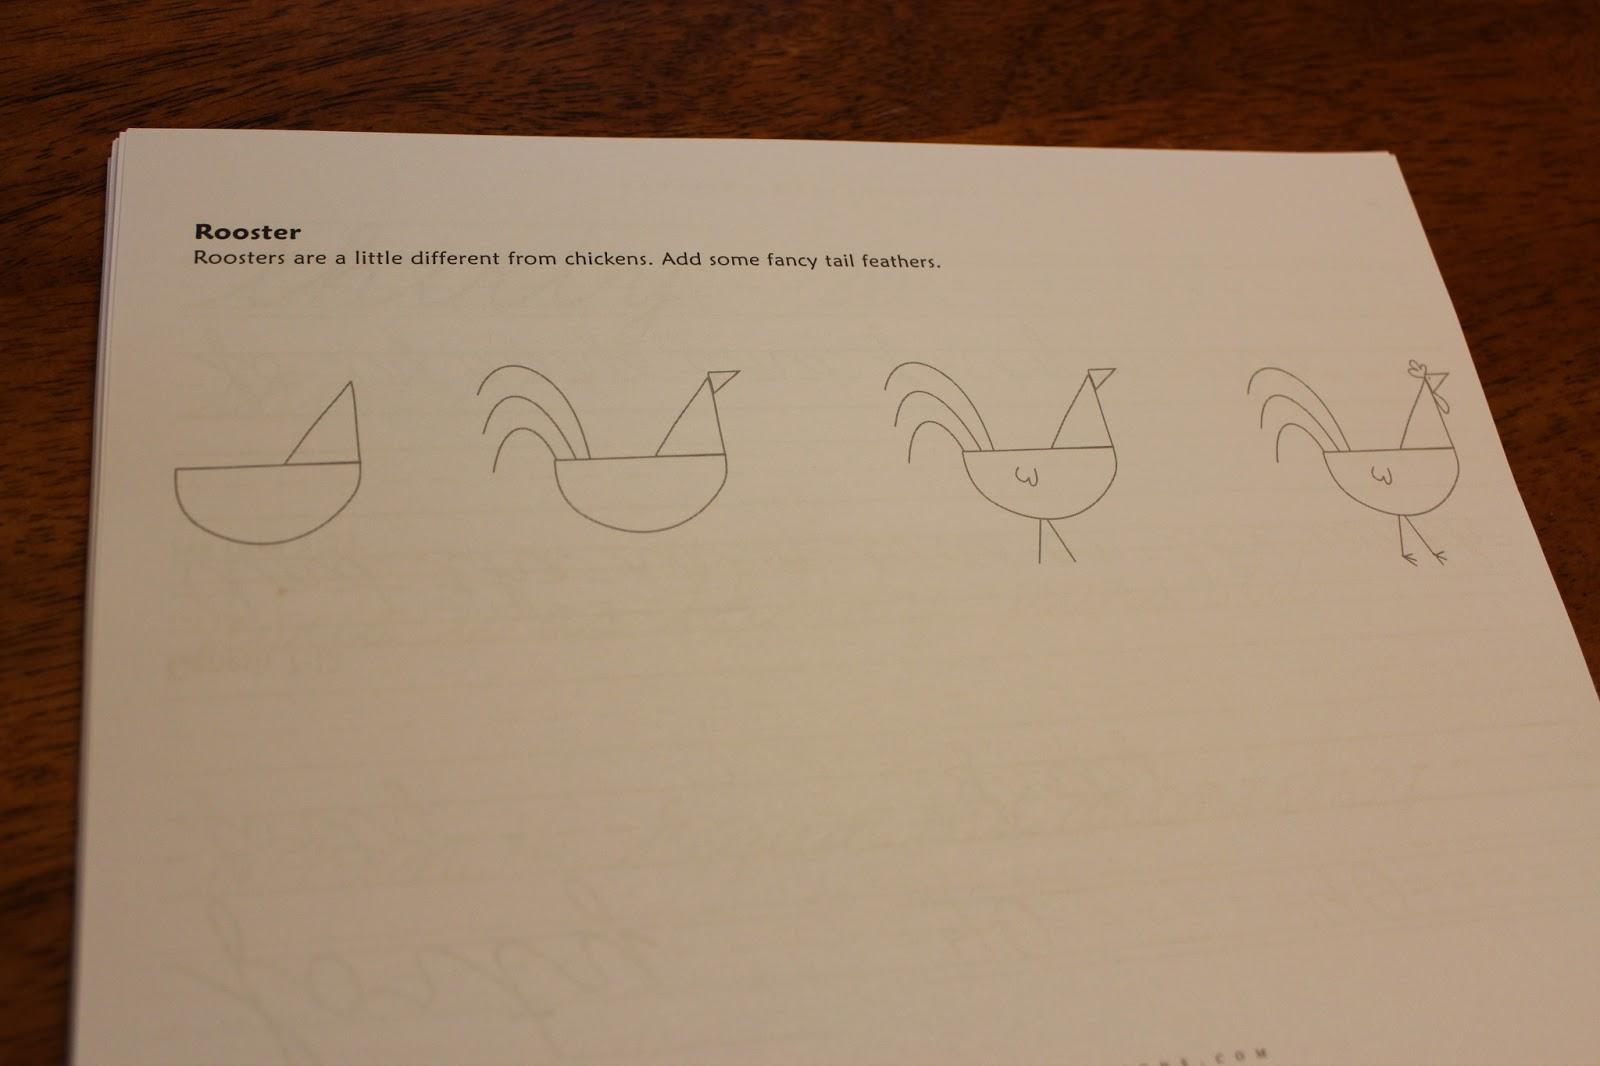 Homeschooling 3 Classical Conversations Prescripts Cursive Words And Drawing Schoolhouse